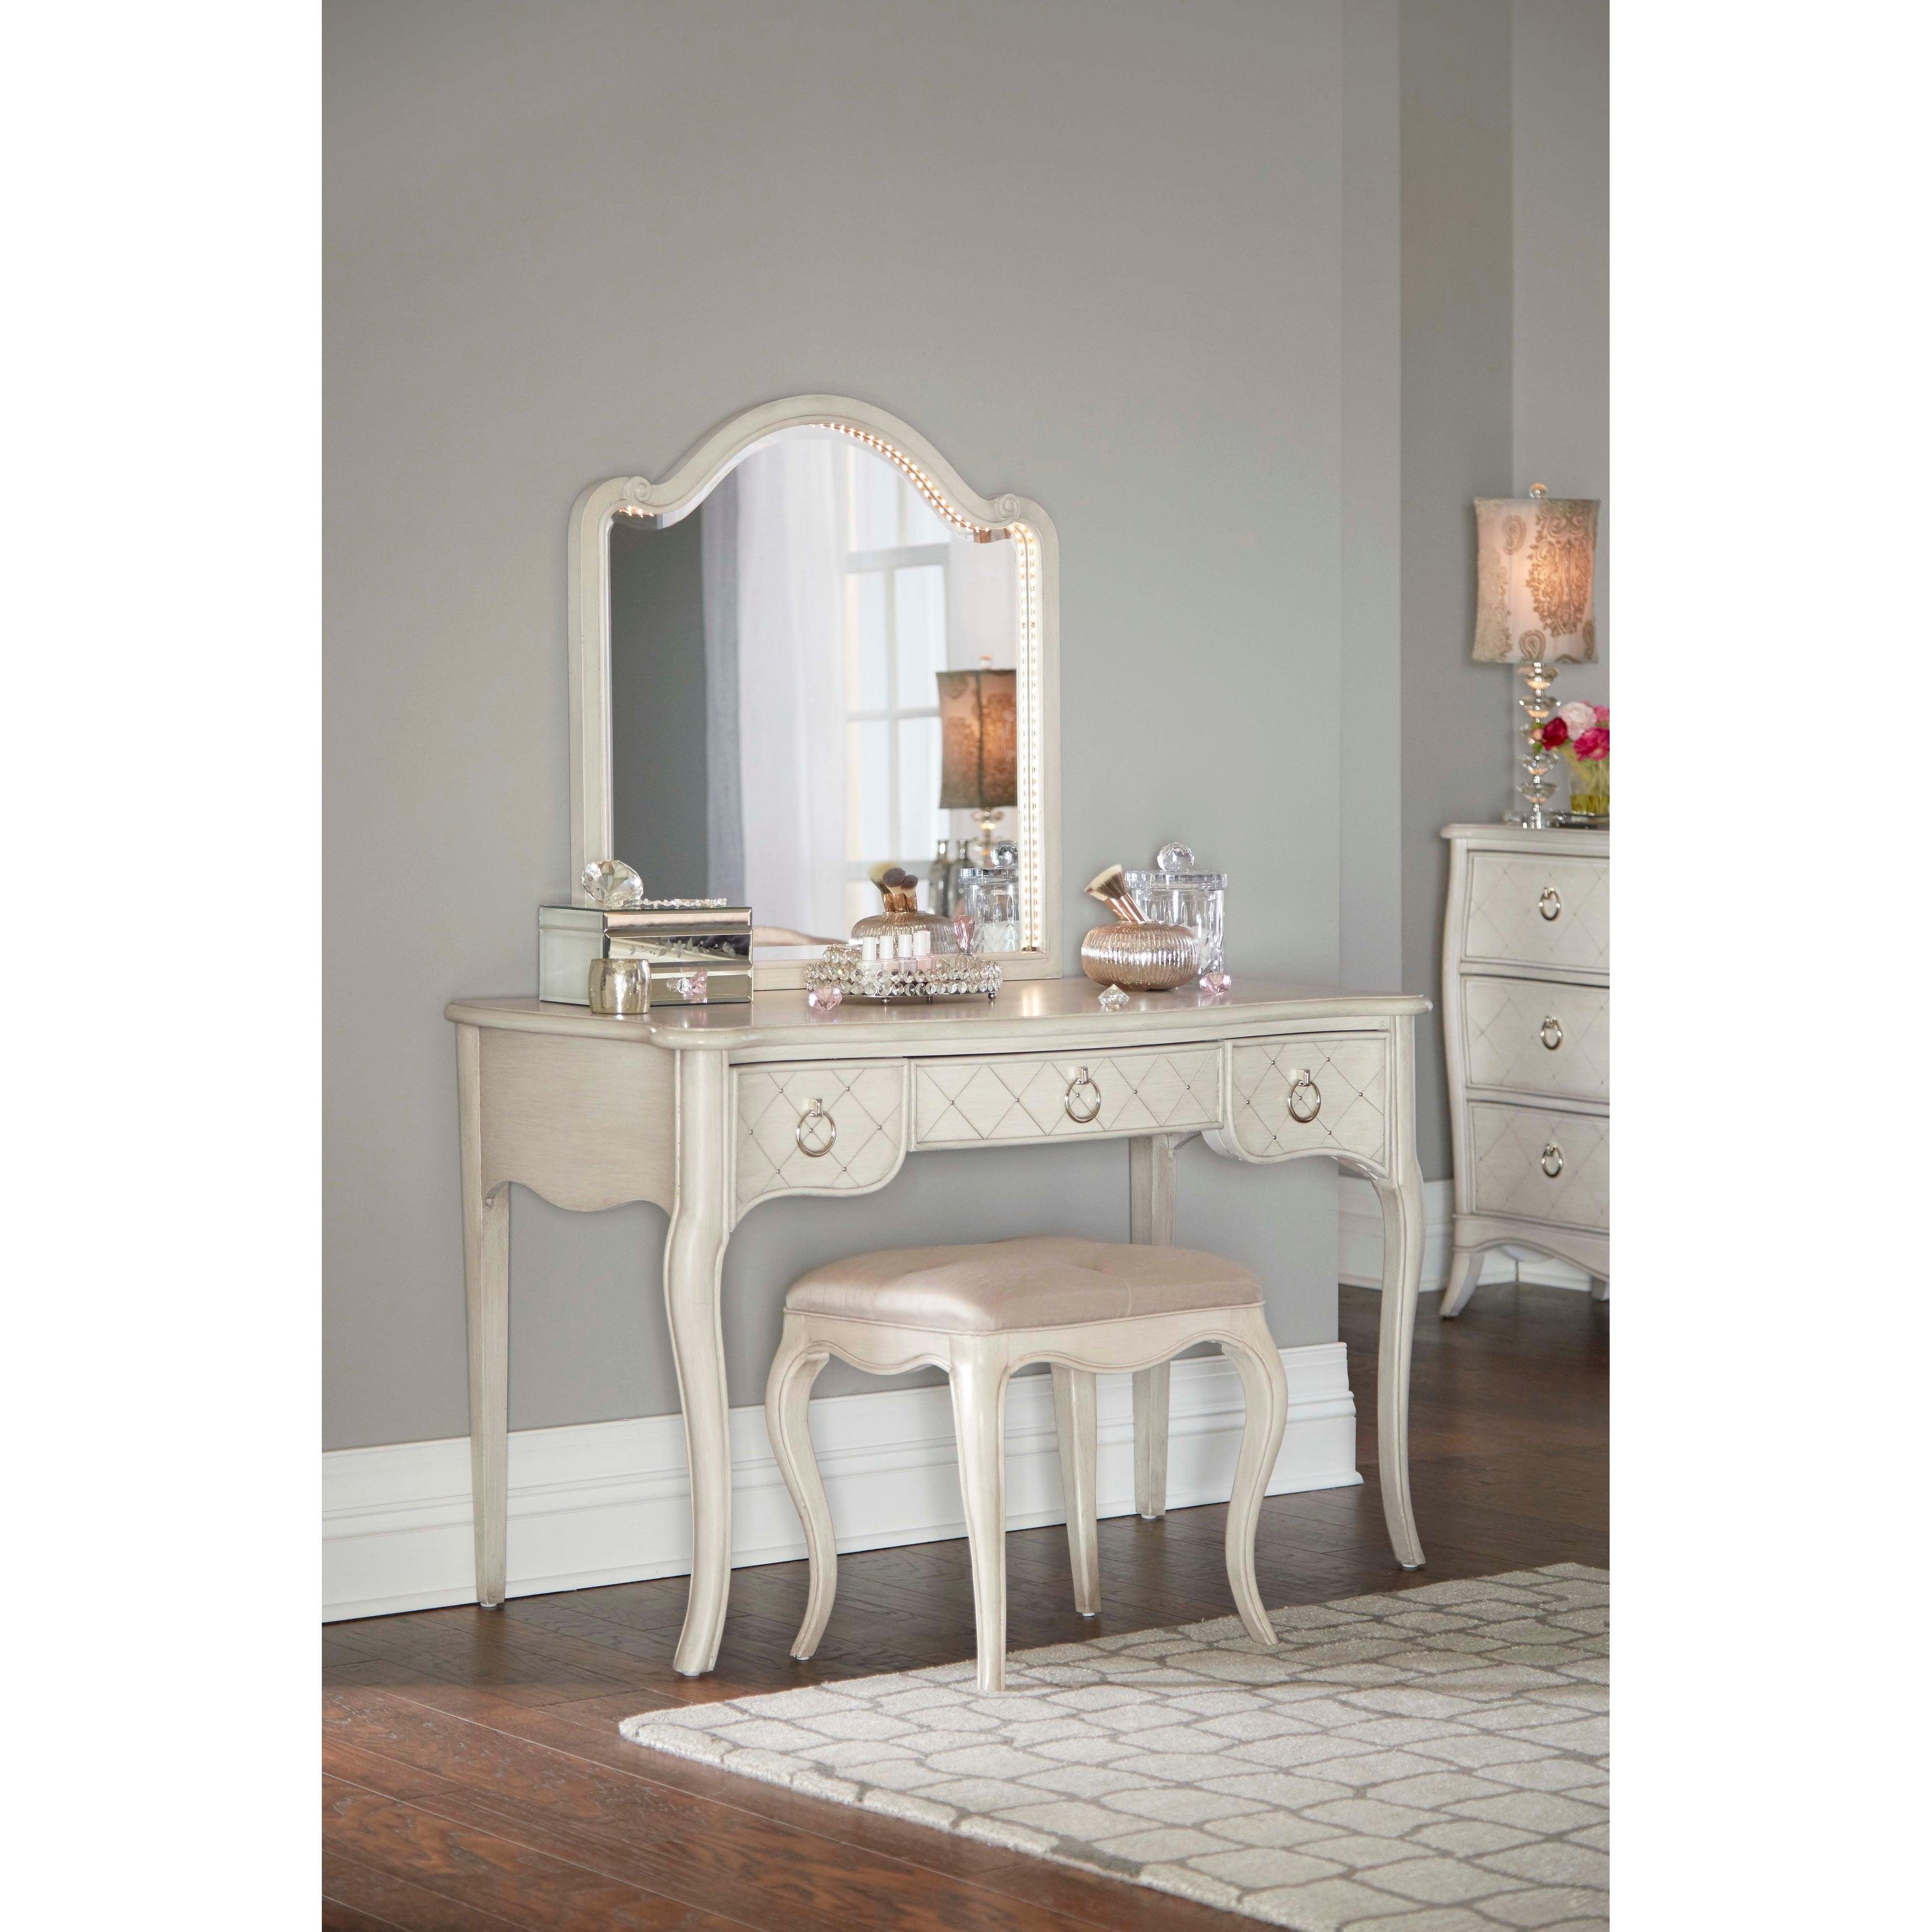 Lighted Vanity Mirror.Hillsdale Angela Desk With Arc Lighted Vanity Mirror And Bench Opal Grey